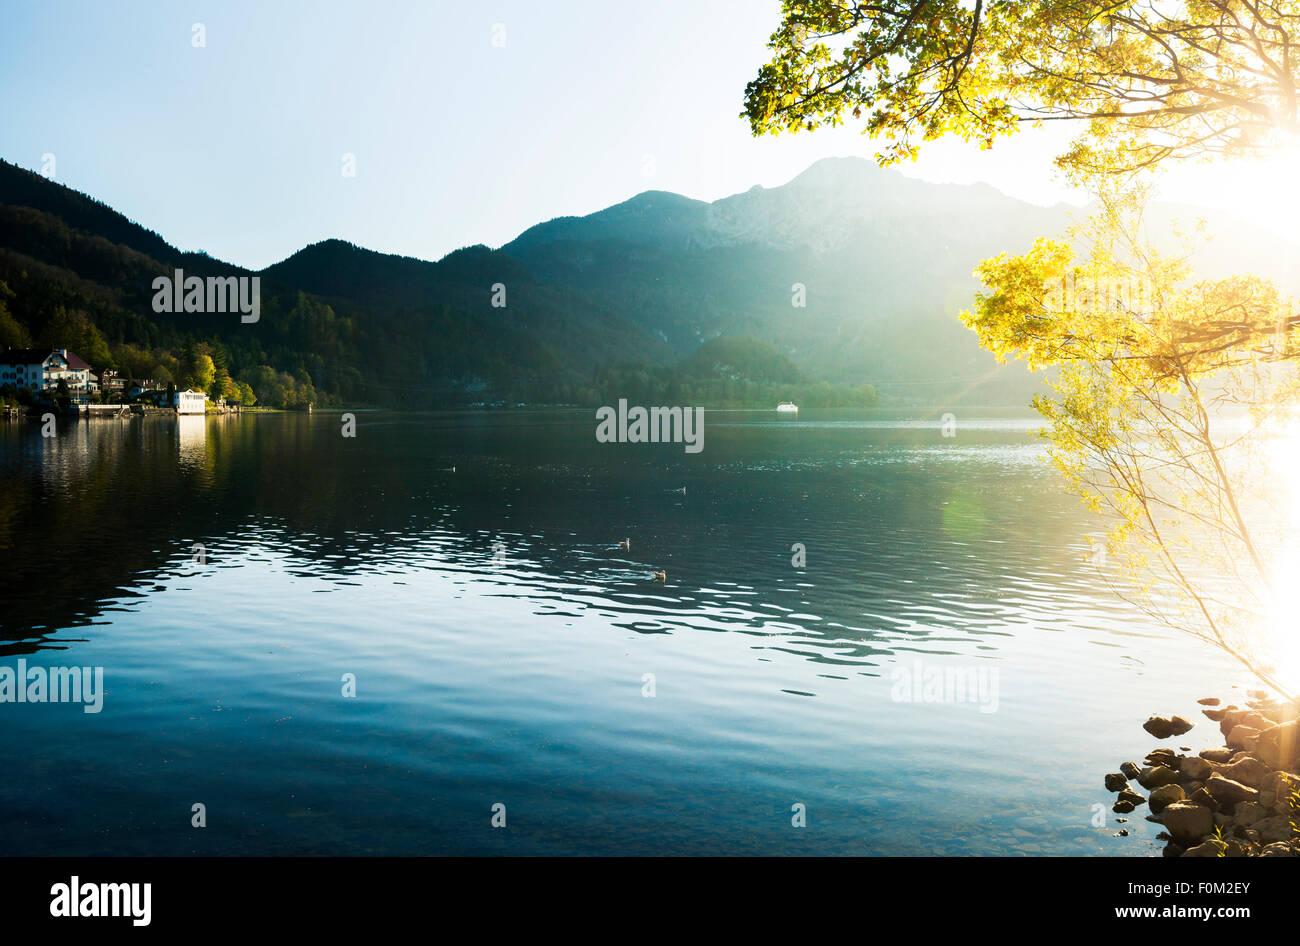 Sonnenuntergang am See Kochel, Bayern, Deutschland Stockbild